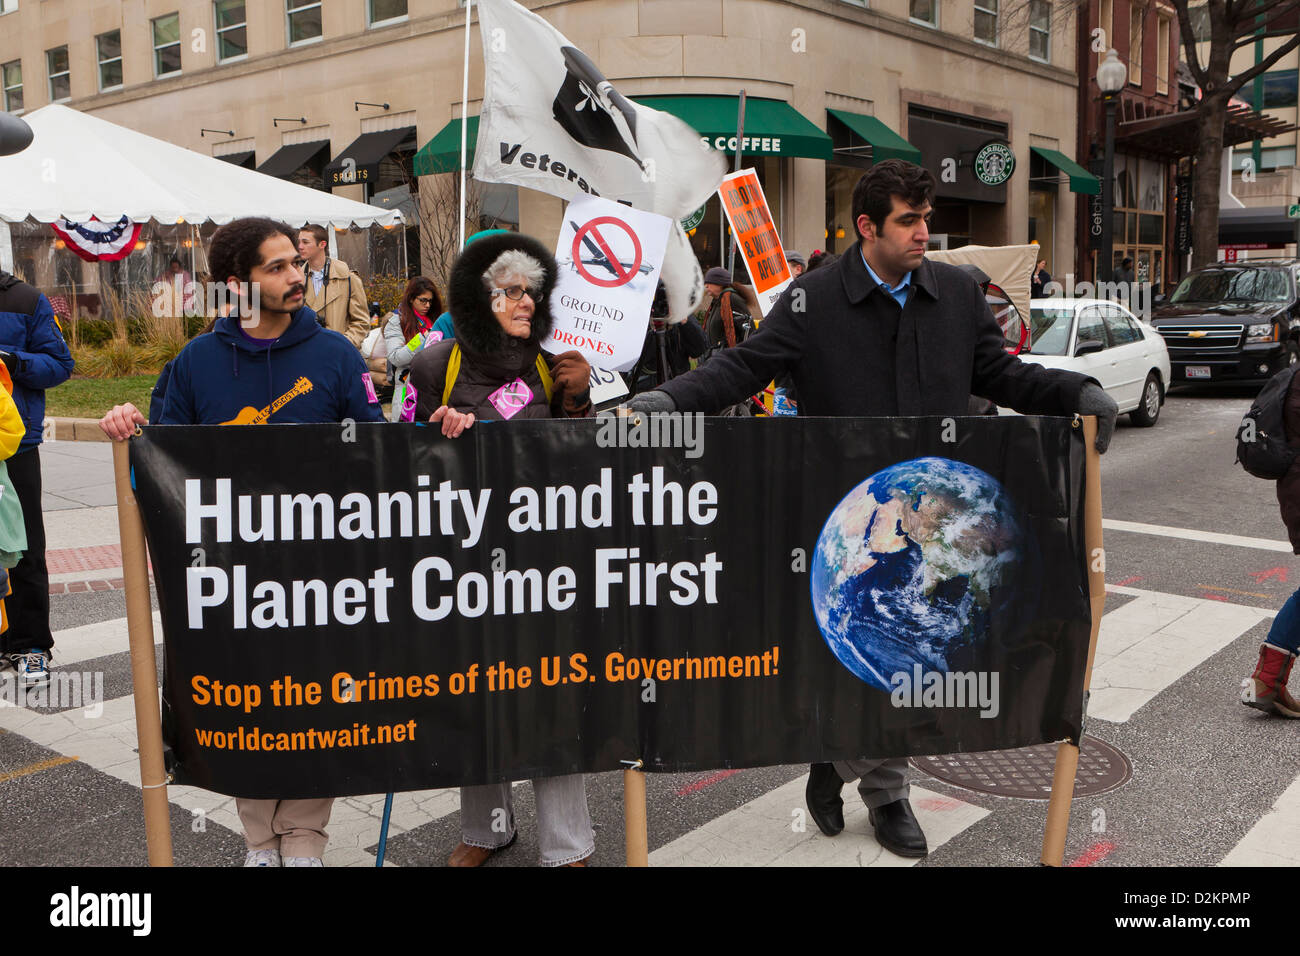 Environmental activists holding banner at protest rally - Washington, DC USA - Stock Image